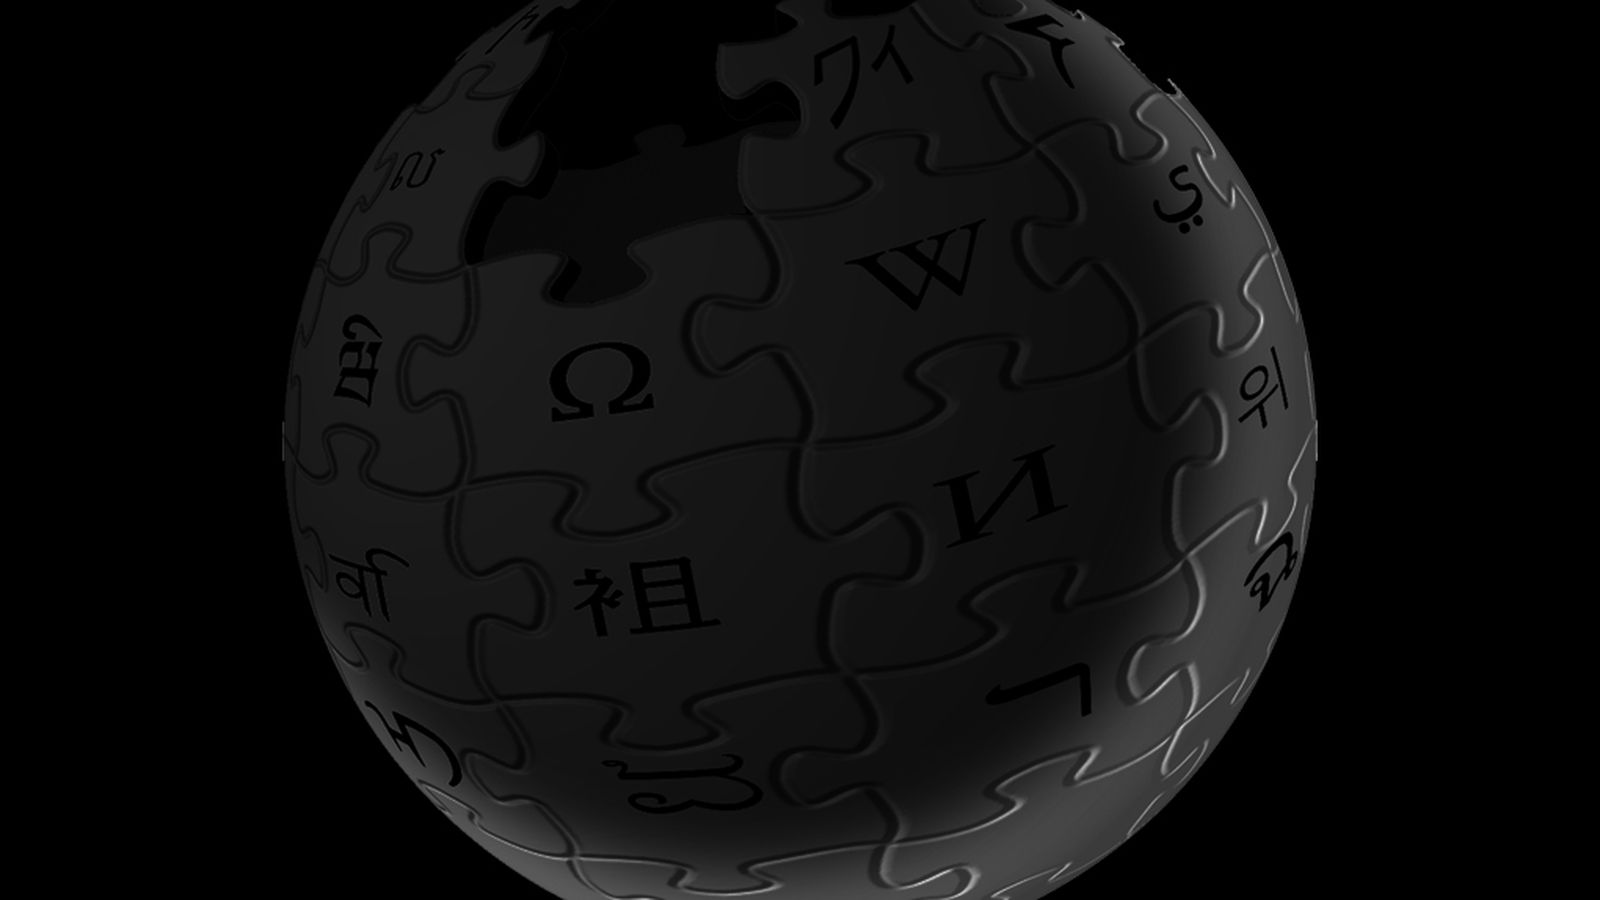 Wiki blacked com Blacked —